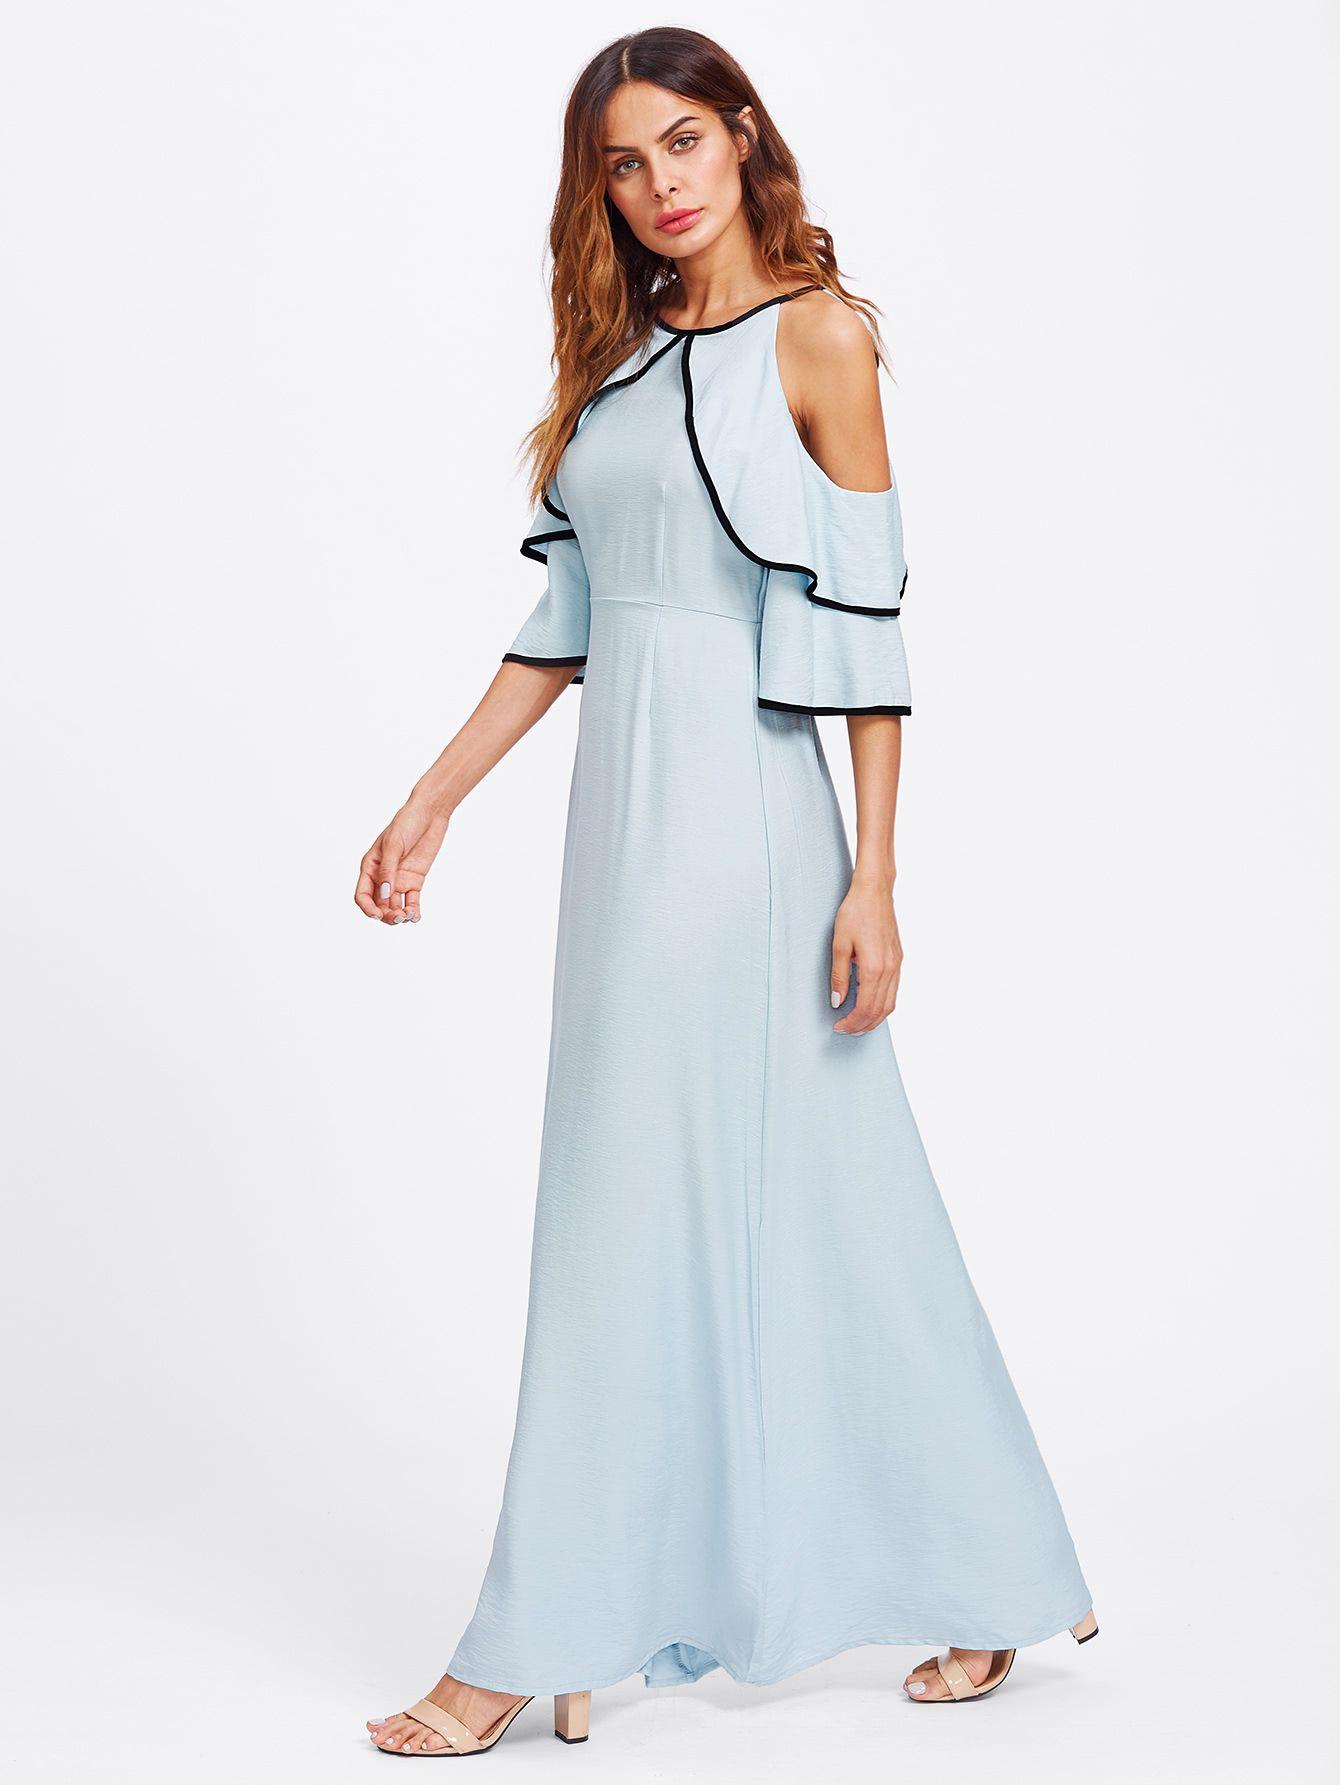 2f9dd9f7ca5c Shop Flounce Open Shoulder Bell Sleeve Contrast Binding Dress online. SheIn  offers Flounce Open Shoulder Bell Sleeve Contrast Binding Dress & more to  fit ...